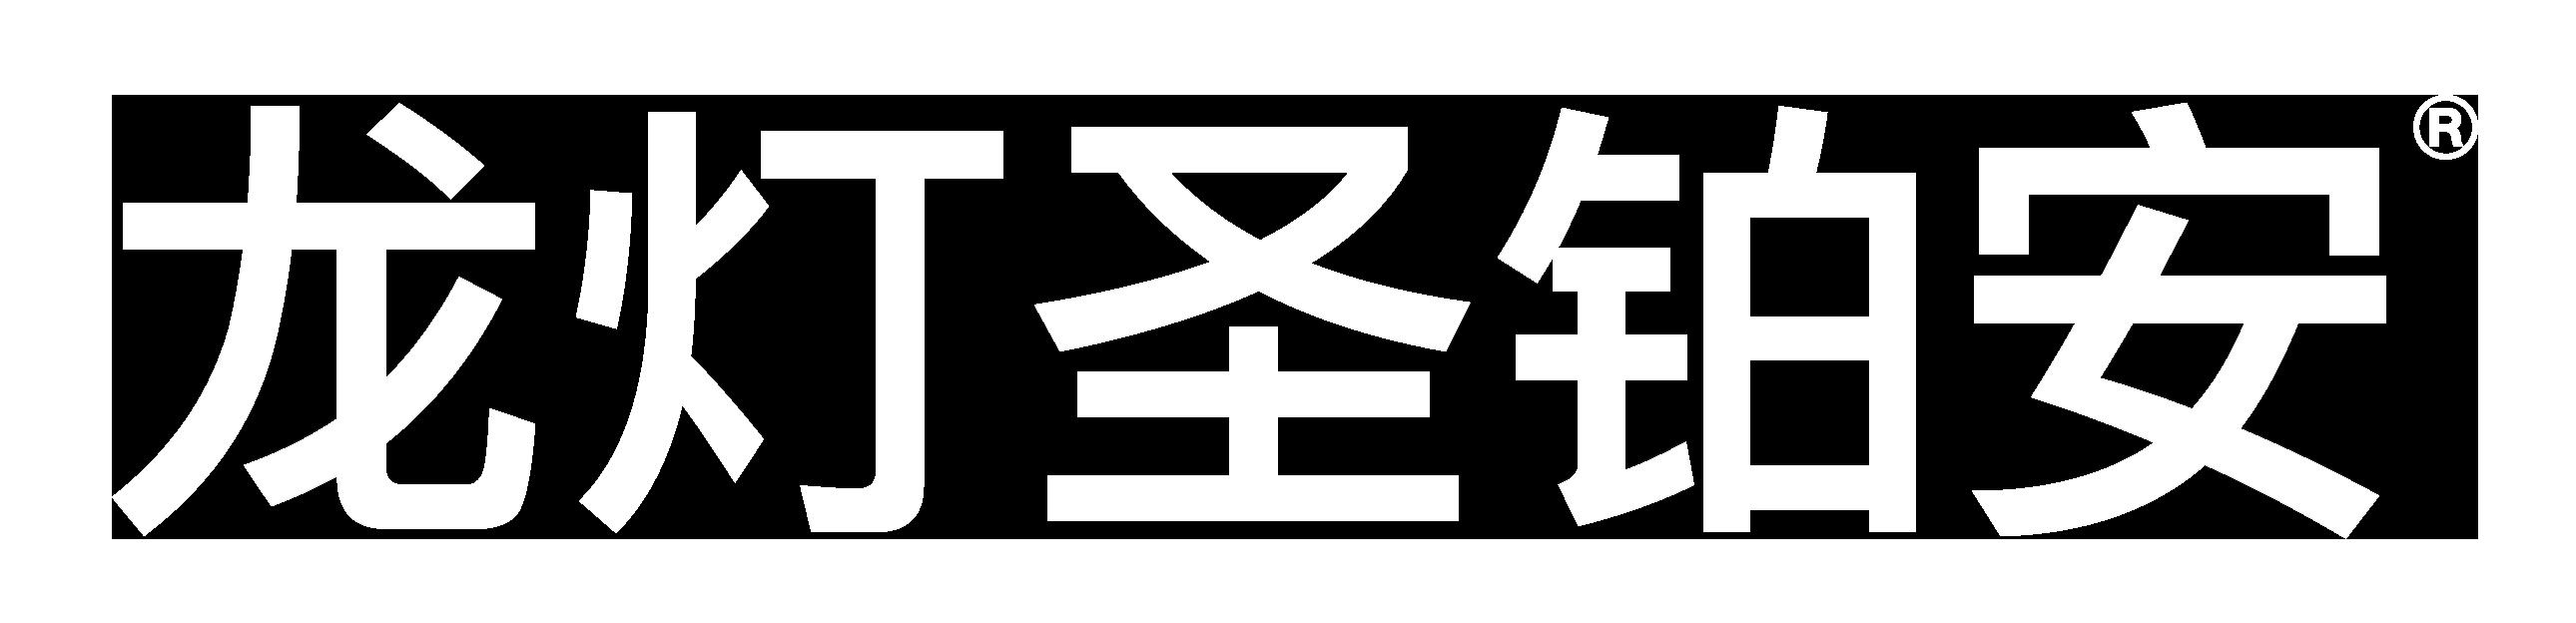 龙灯圣铂安_white_filter